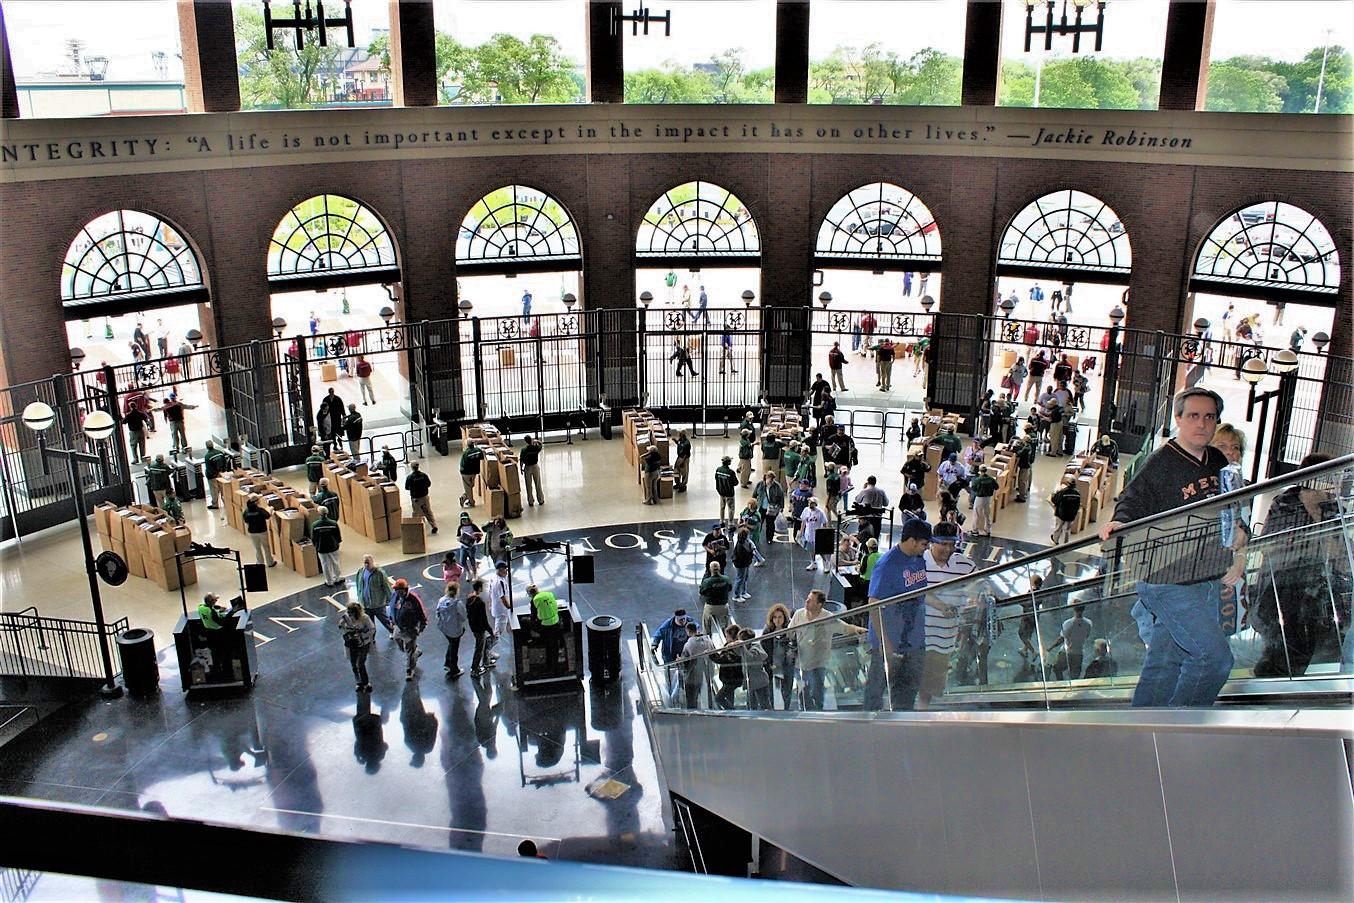 2009 06 21 Law School Road Trip Day 6 New York Mets 50.jpg